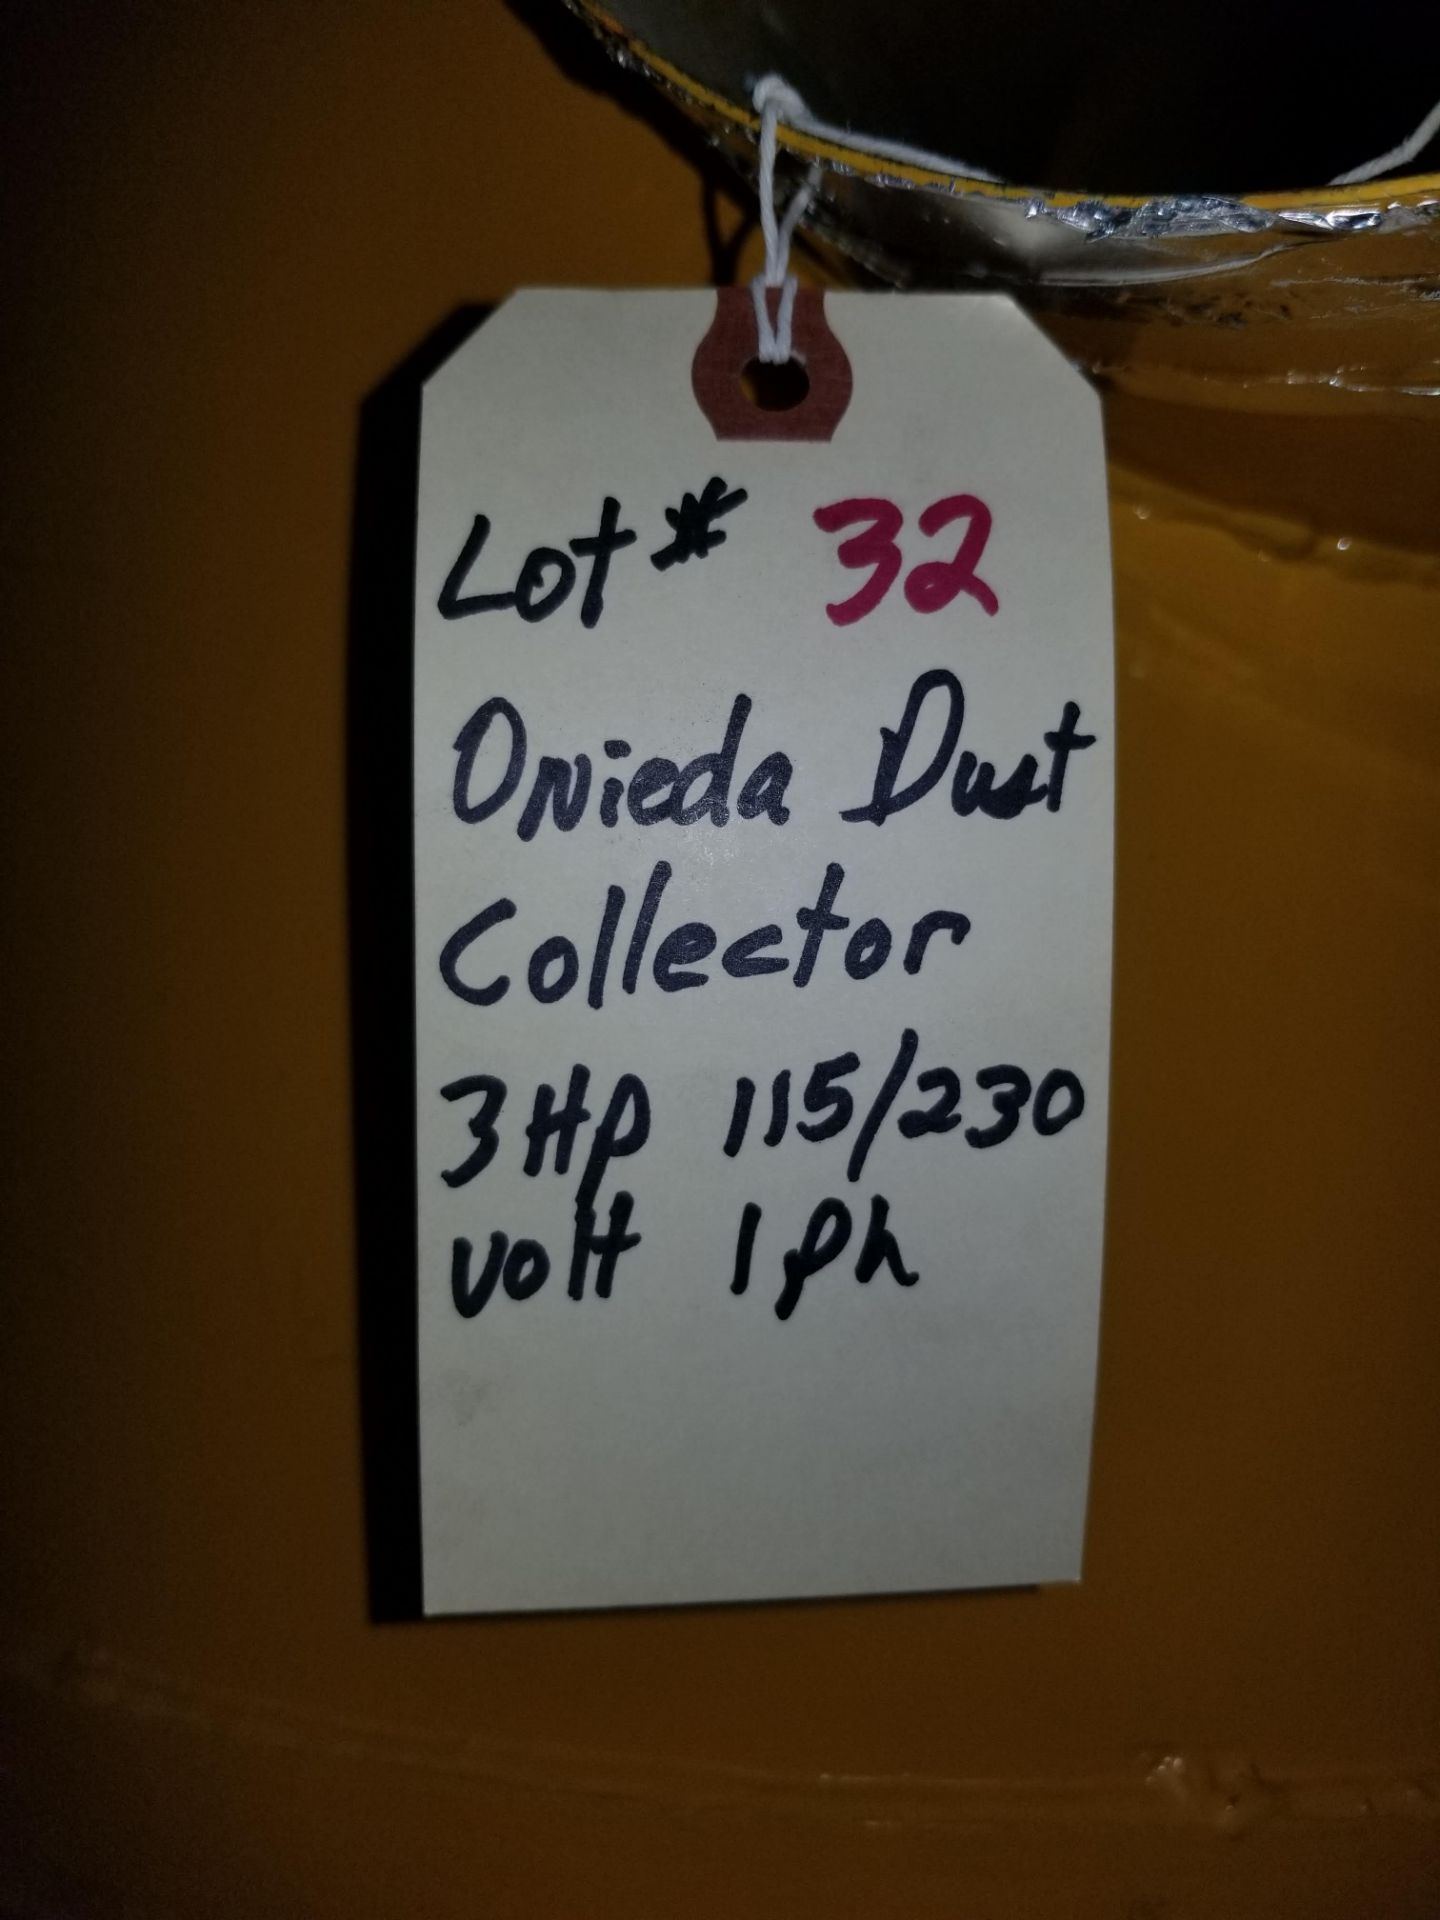 Lot 32 - Oneida Dust Collector 3hp Super Dust Gorilla, 3hp 1ph 115/230V